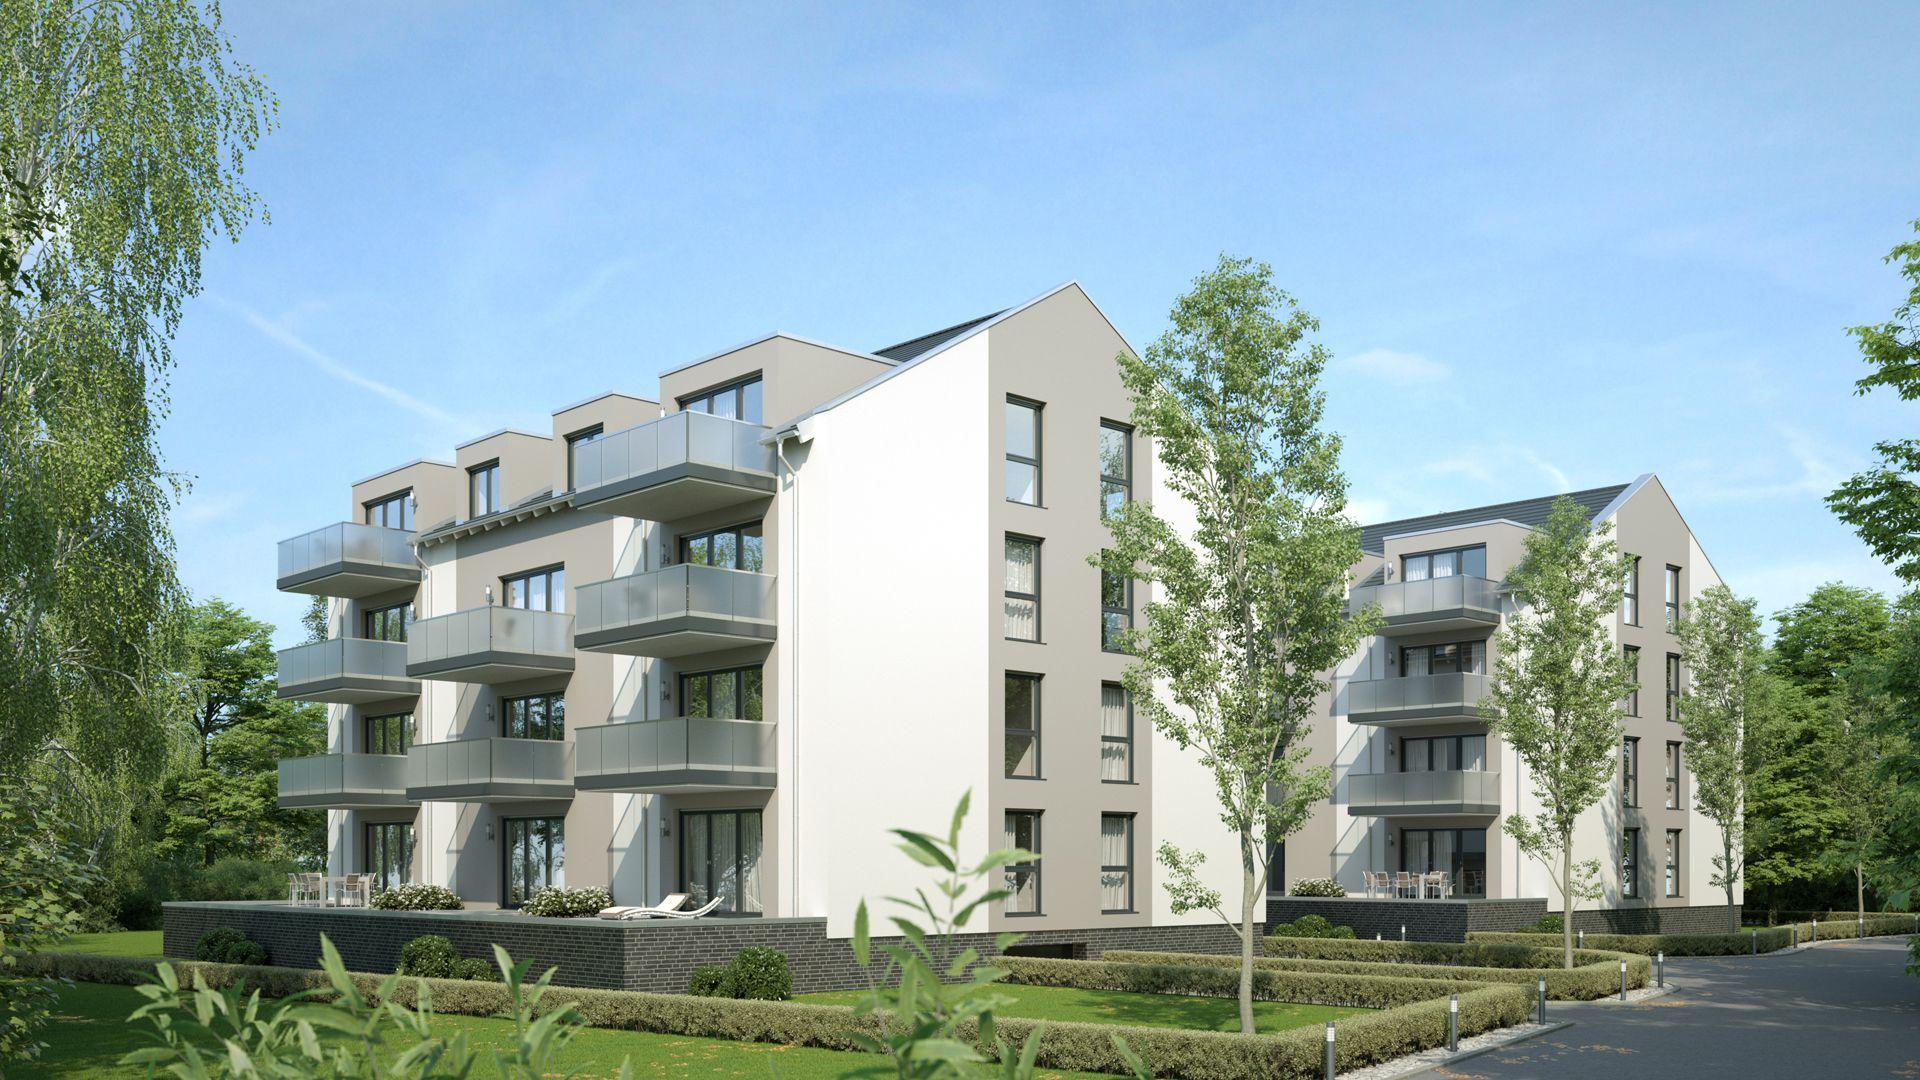 3D Visualisierung Berlin Königs Wusterhausen Wohnhäuser